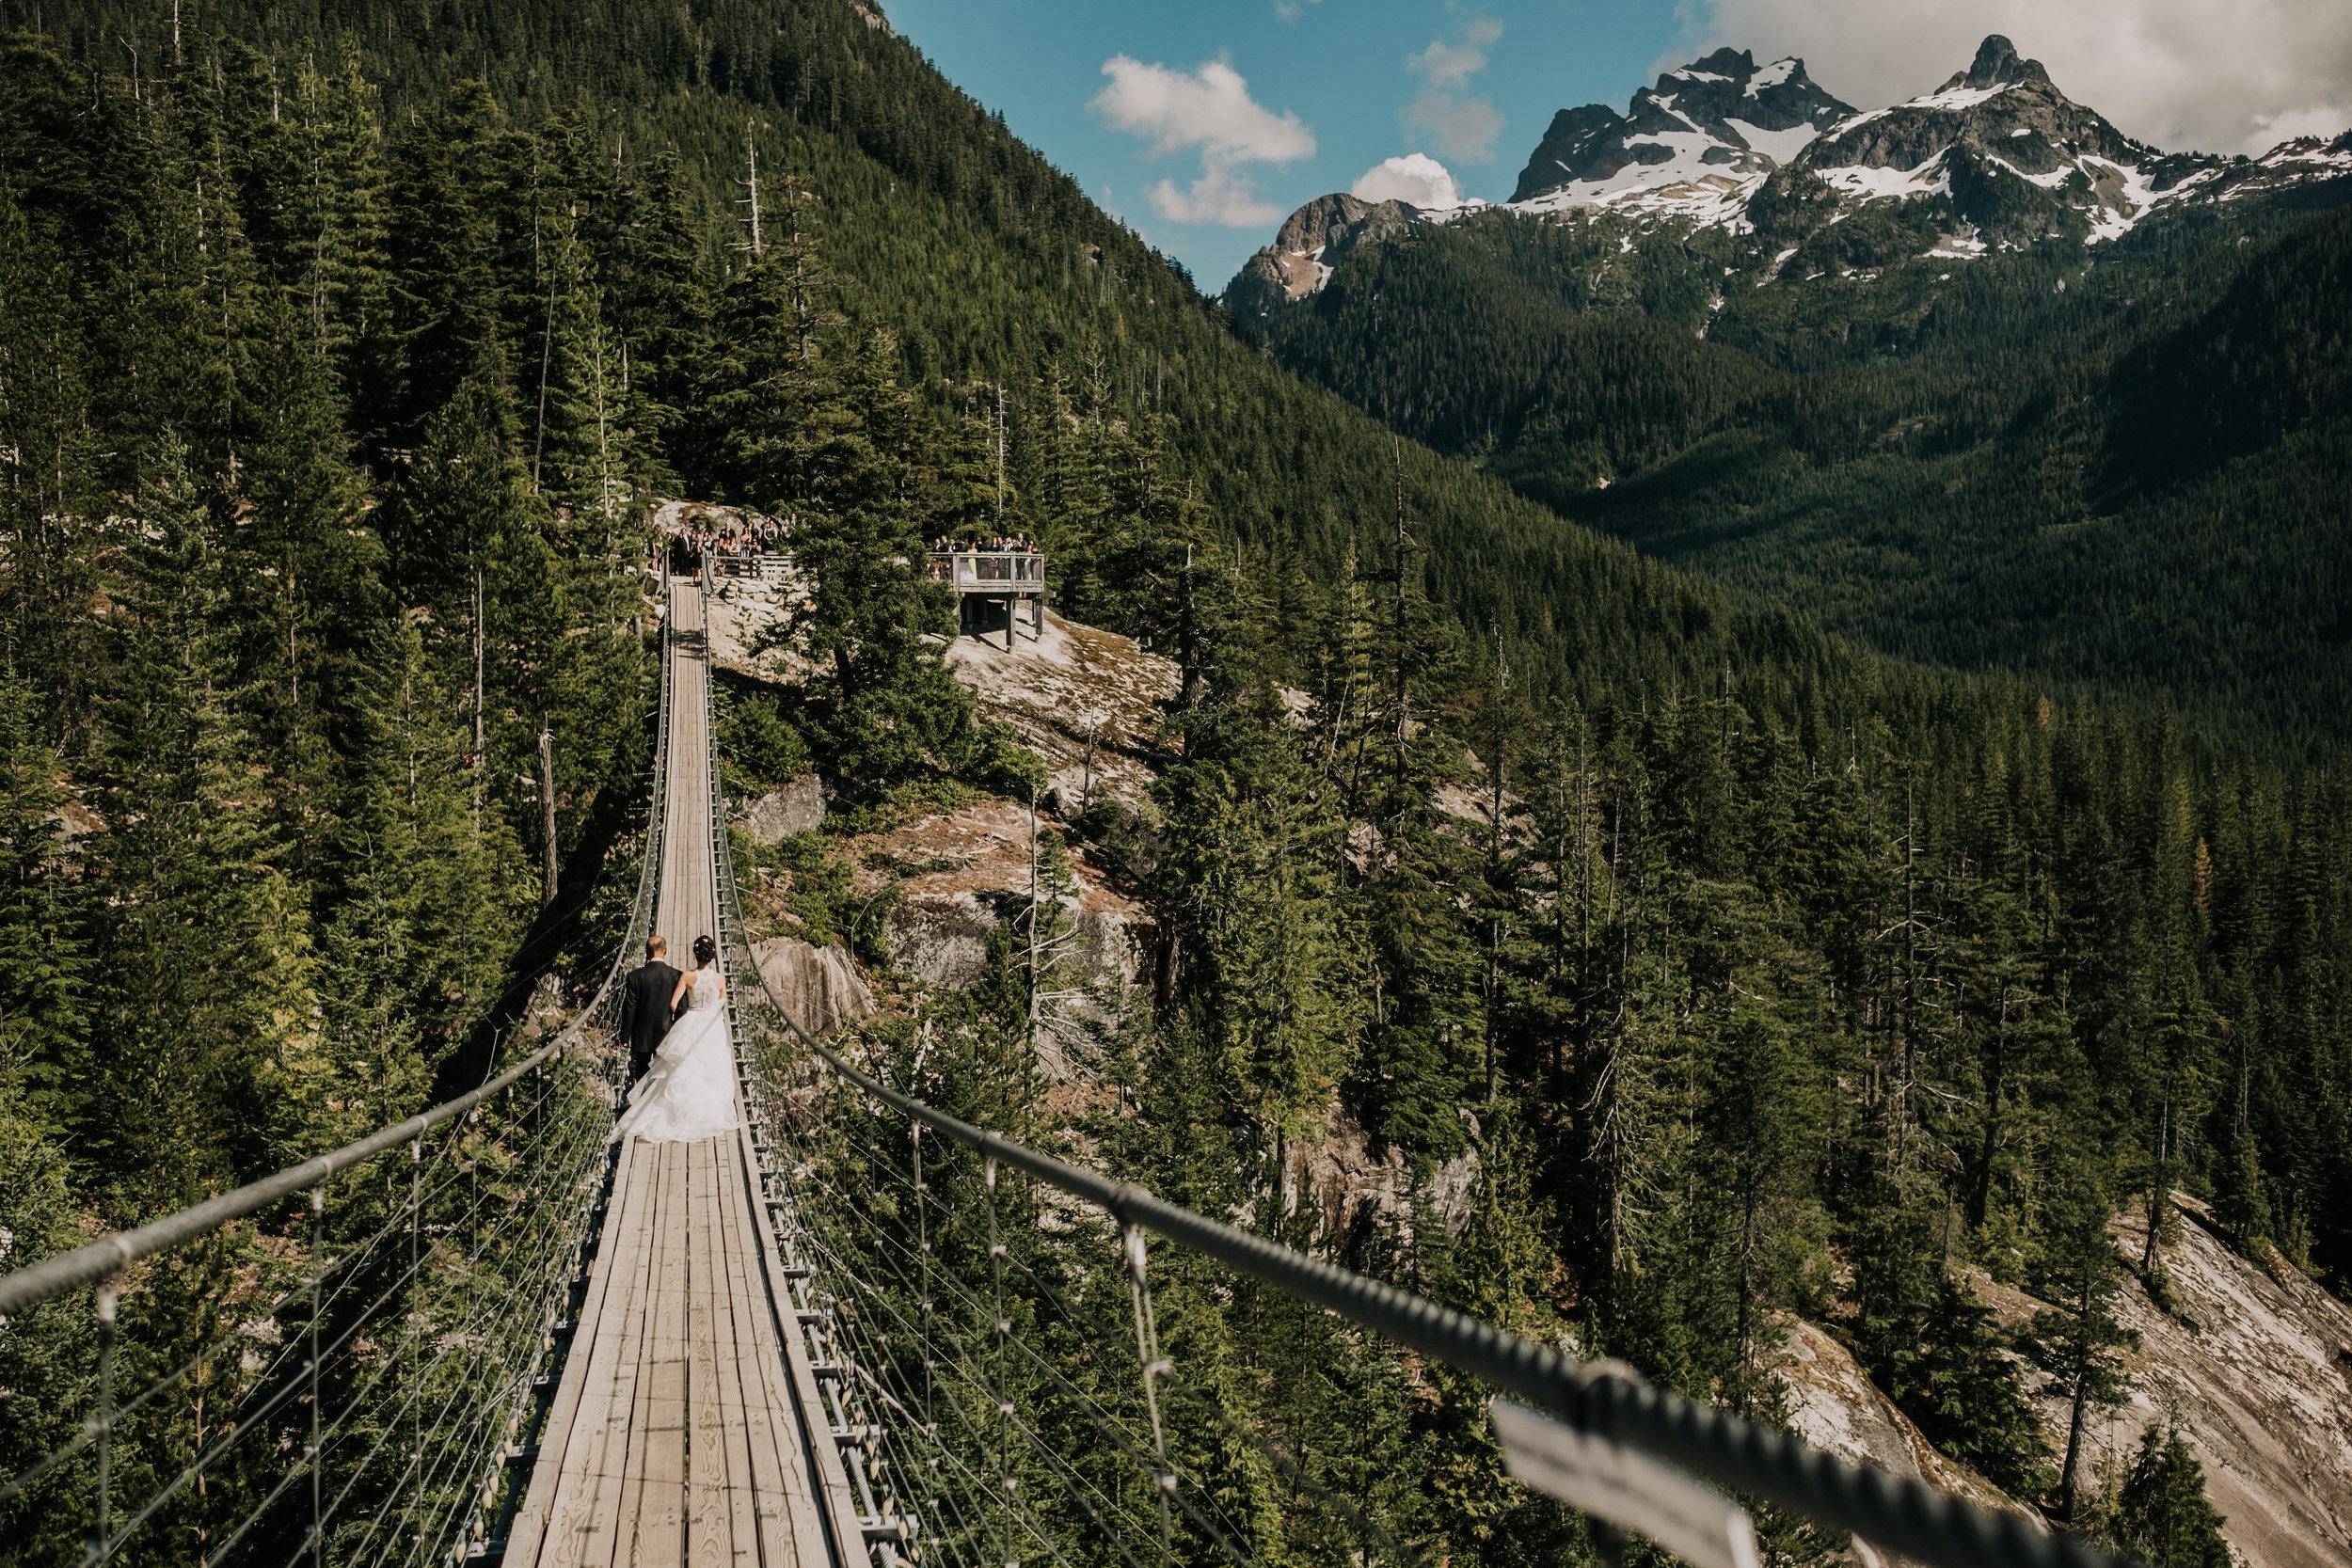 Squamish Wedding Photographer - Sea to Sky Gondola Wedding Photos -  Vancouver Wedding Photographer & Videographer - Sunshine Coast Wedding Photos - Sunshine Coast Wedding Photographer - Jennifer Picard Photography - DSCF7099.jpg